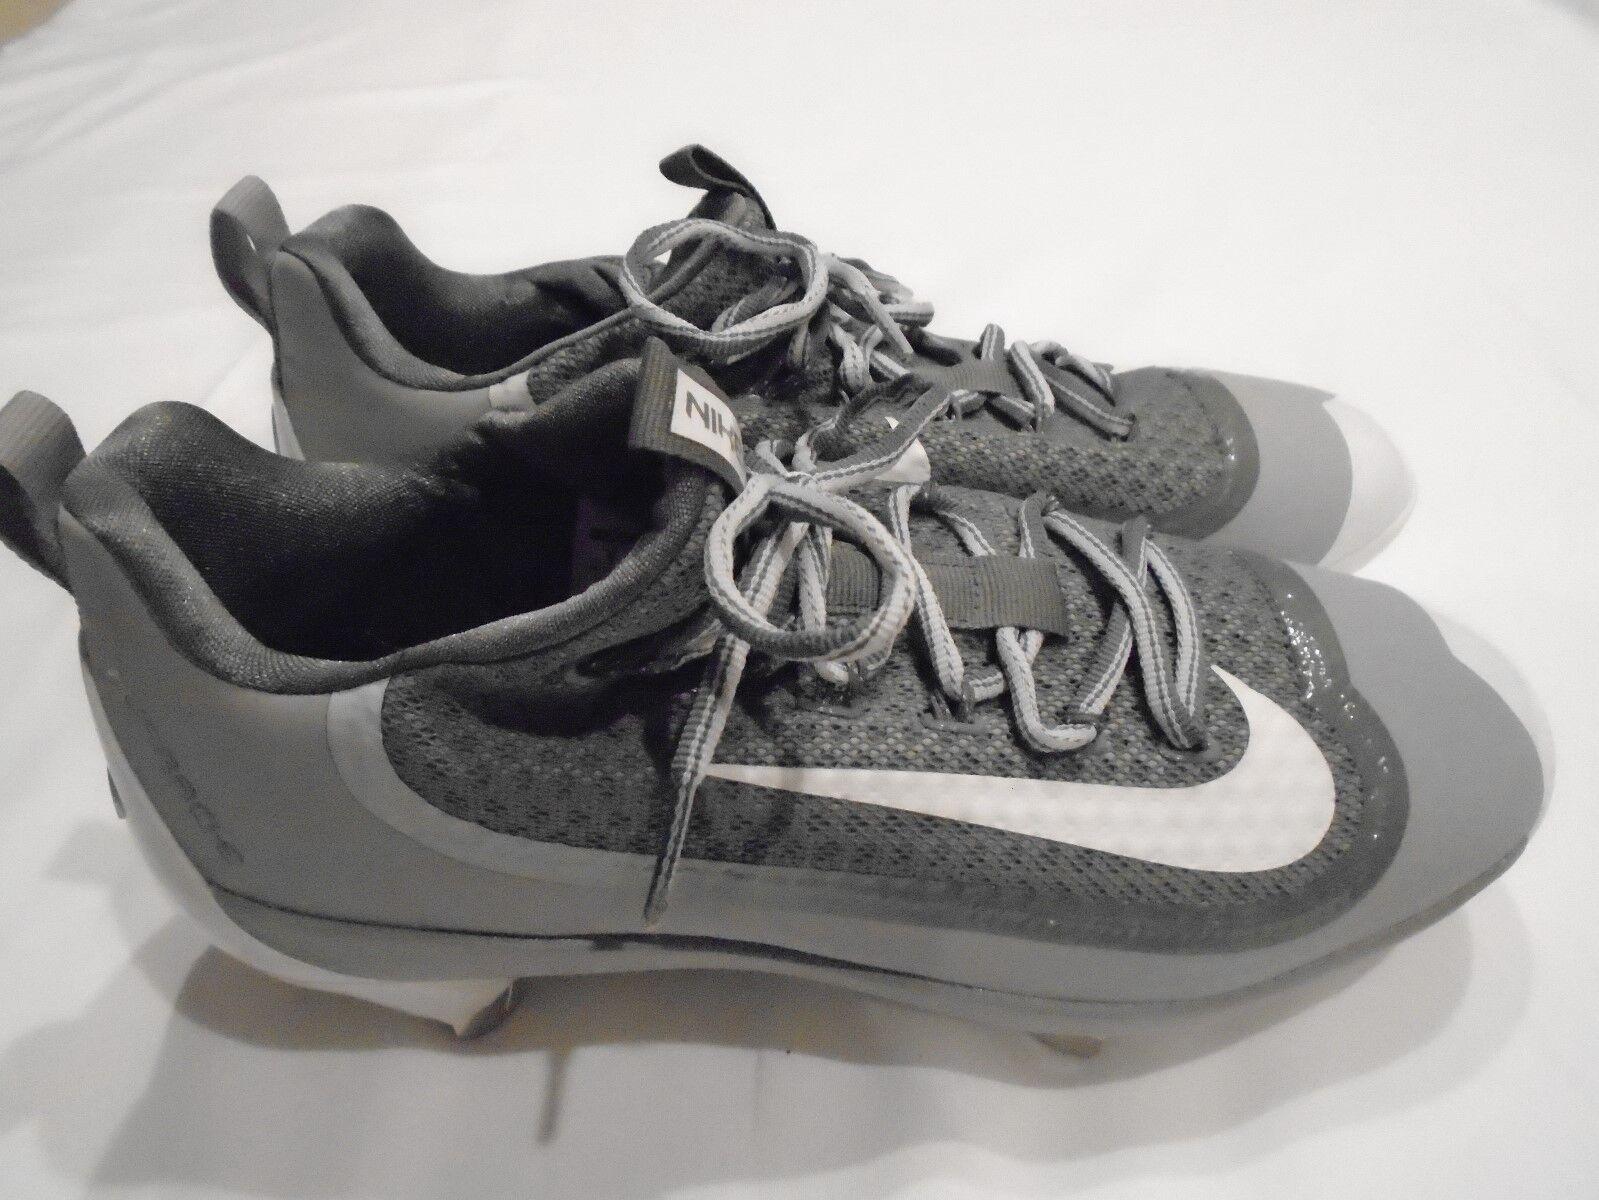 Nike huarache uomini di aria nuova huarache Nike 2k sporcizia elite basso metal scarpe da baseball 934297